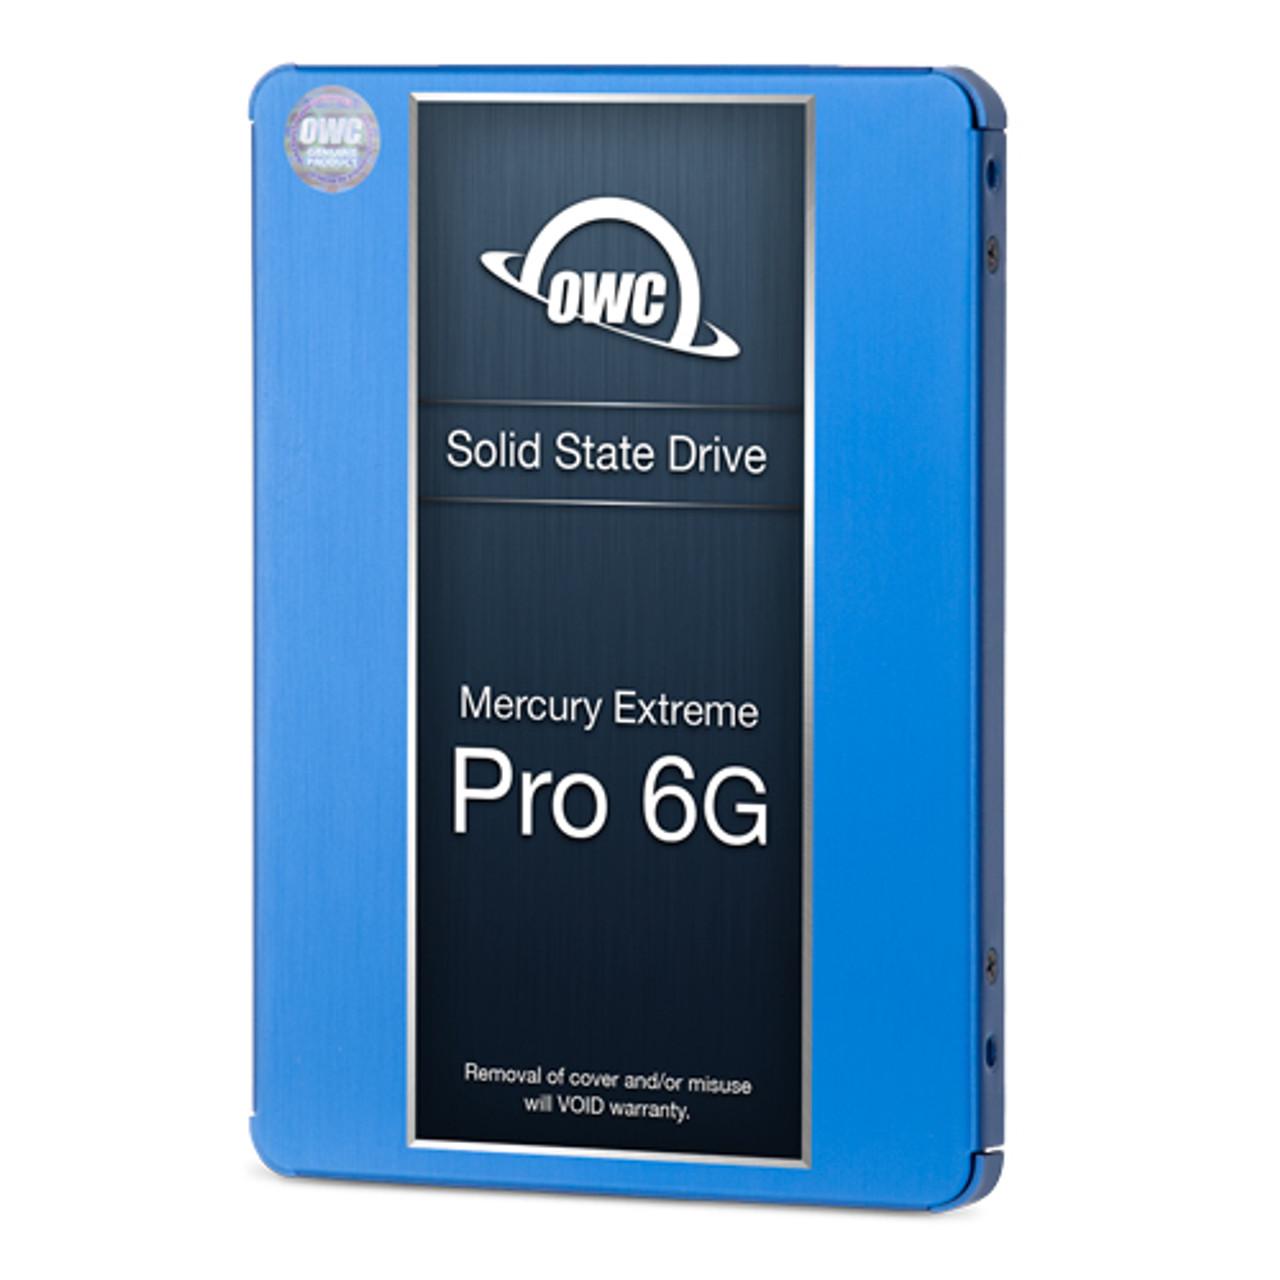 480GB OWC Mercury Extreme 6G SSD - SSD Bay Add-In Kit for 2011 27-inch iMacs